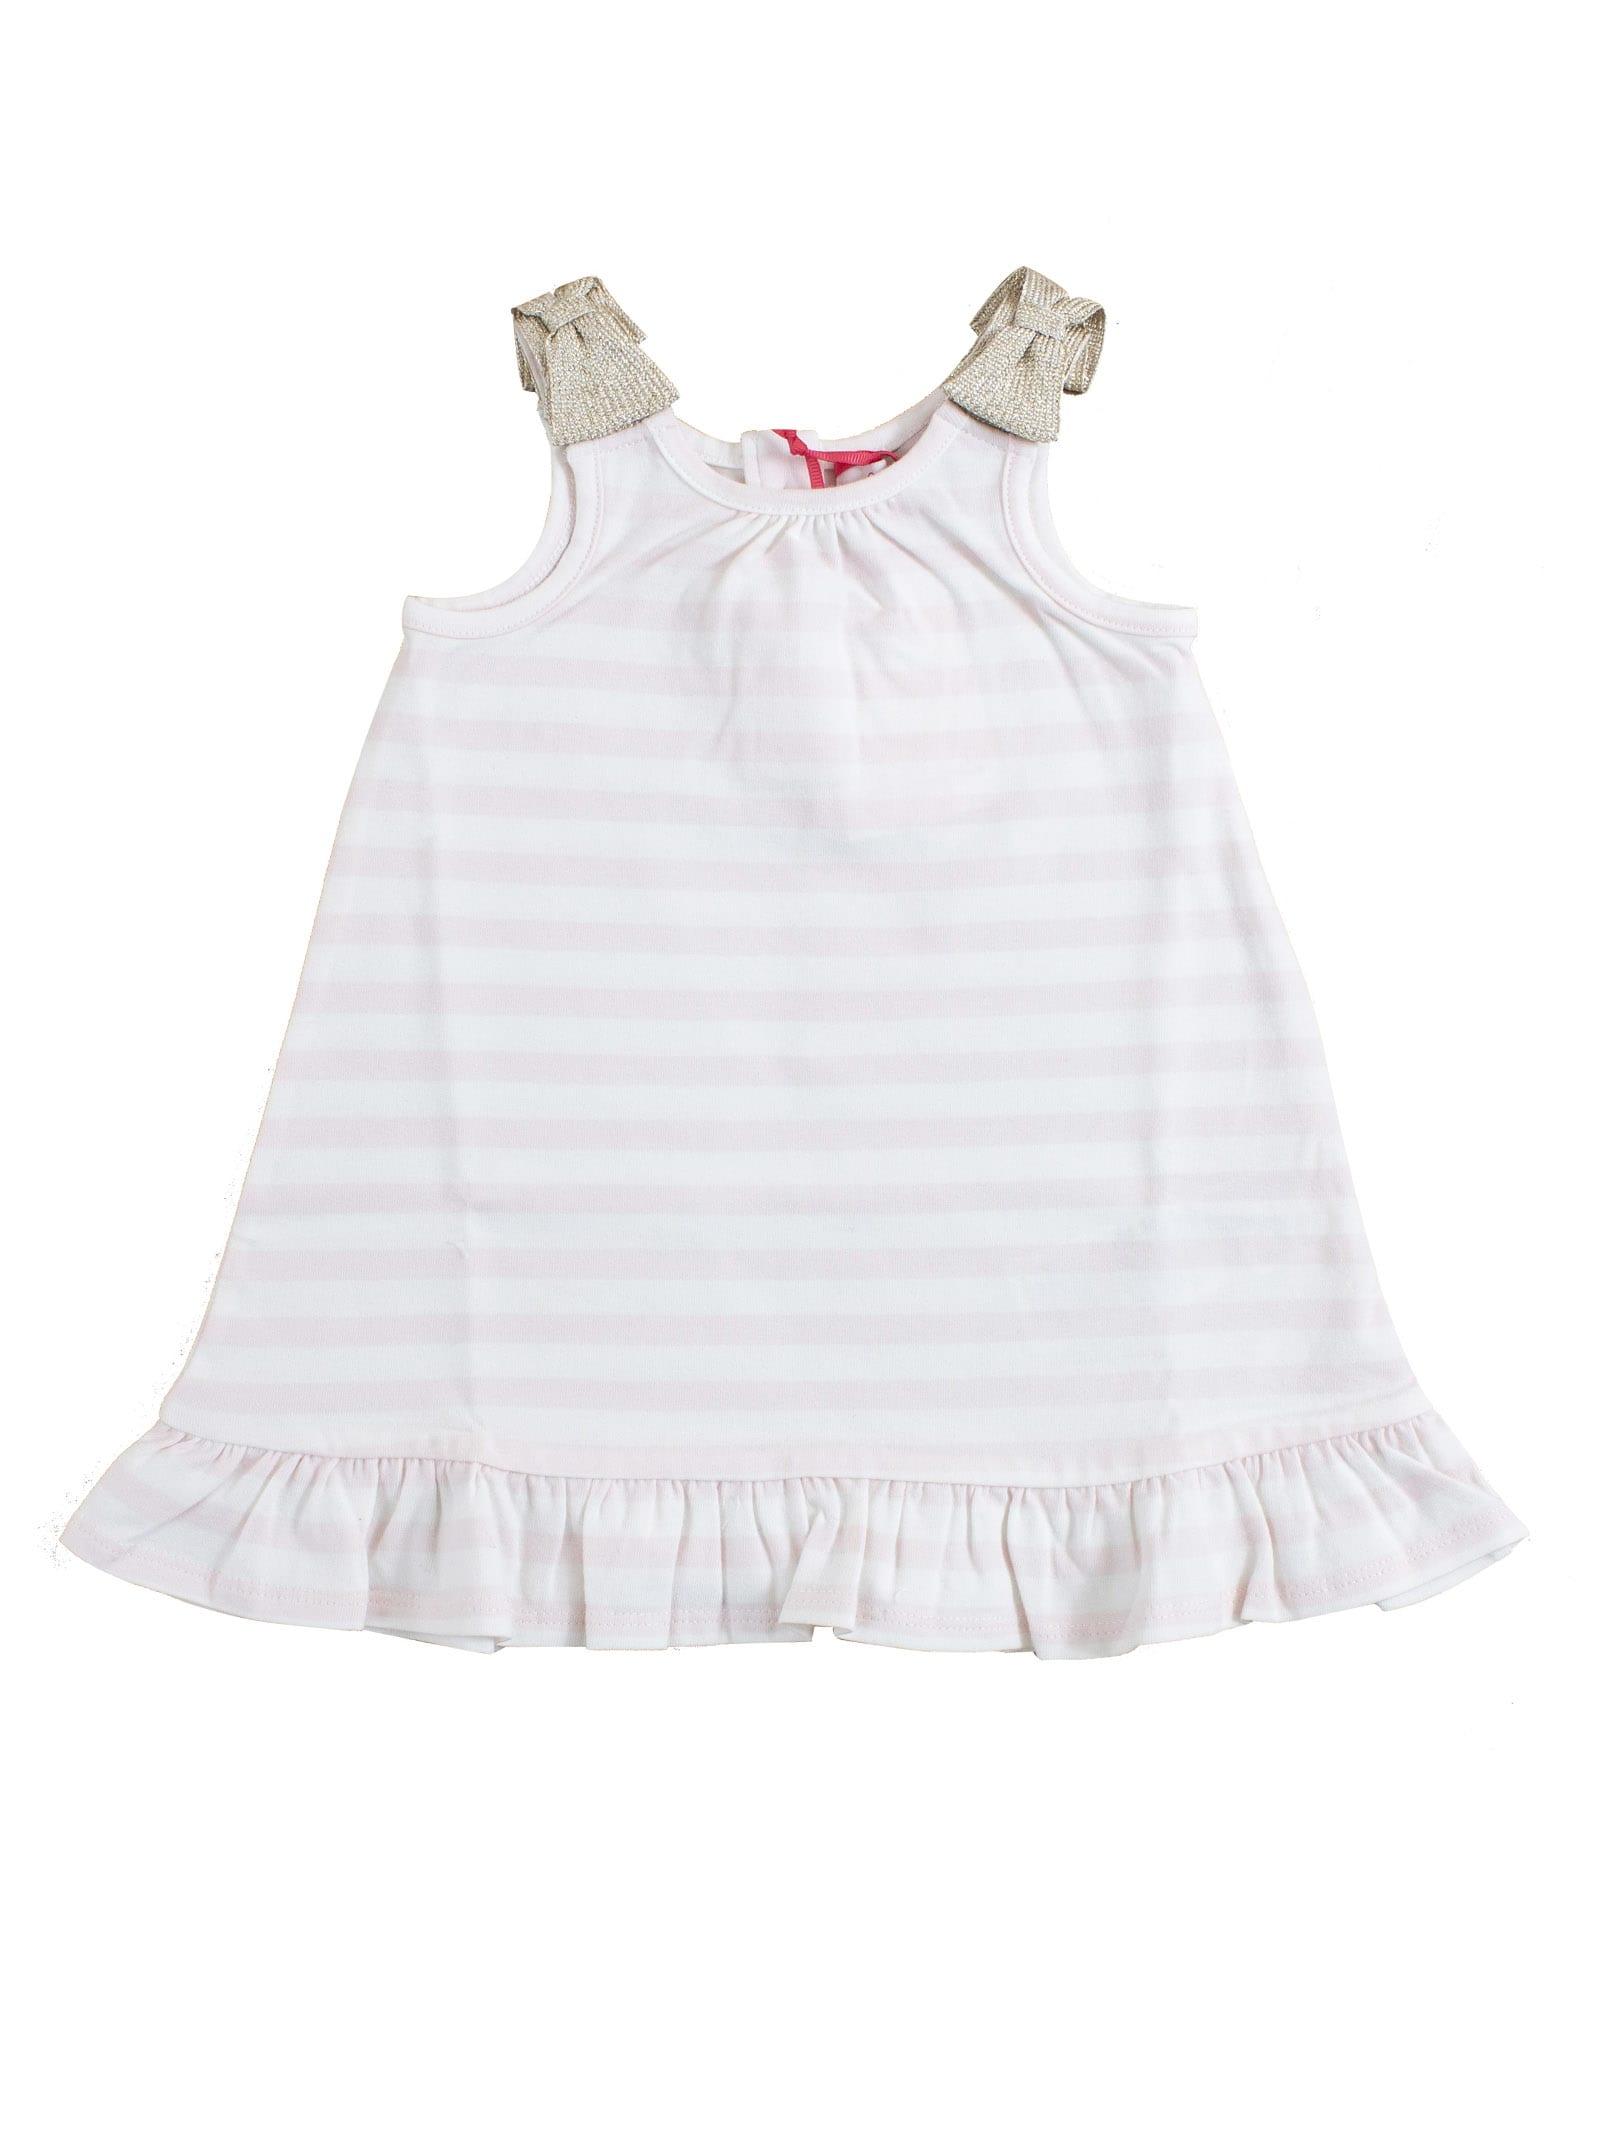 Buy Lili Gaufrette Newborn Dress With Ruffles online, shop Lili Gaufrette with free shipping